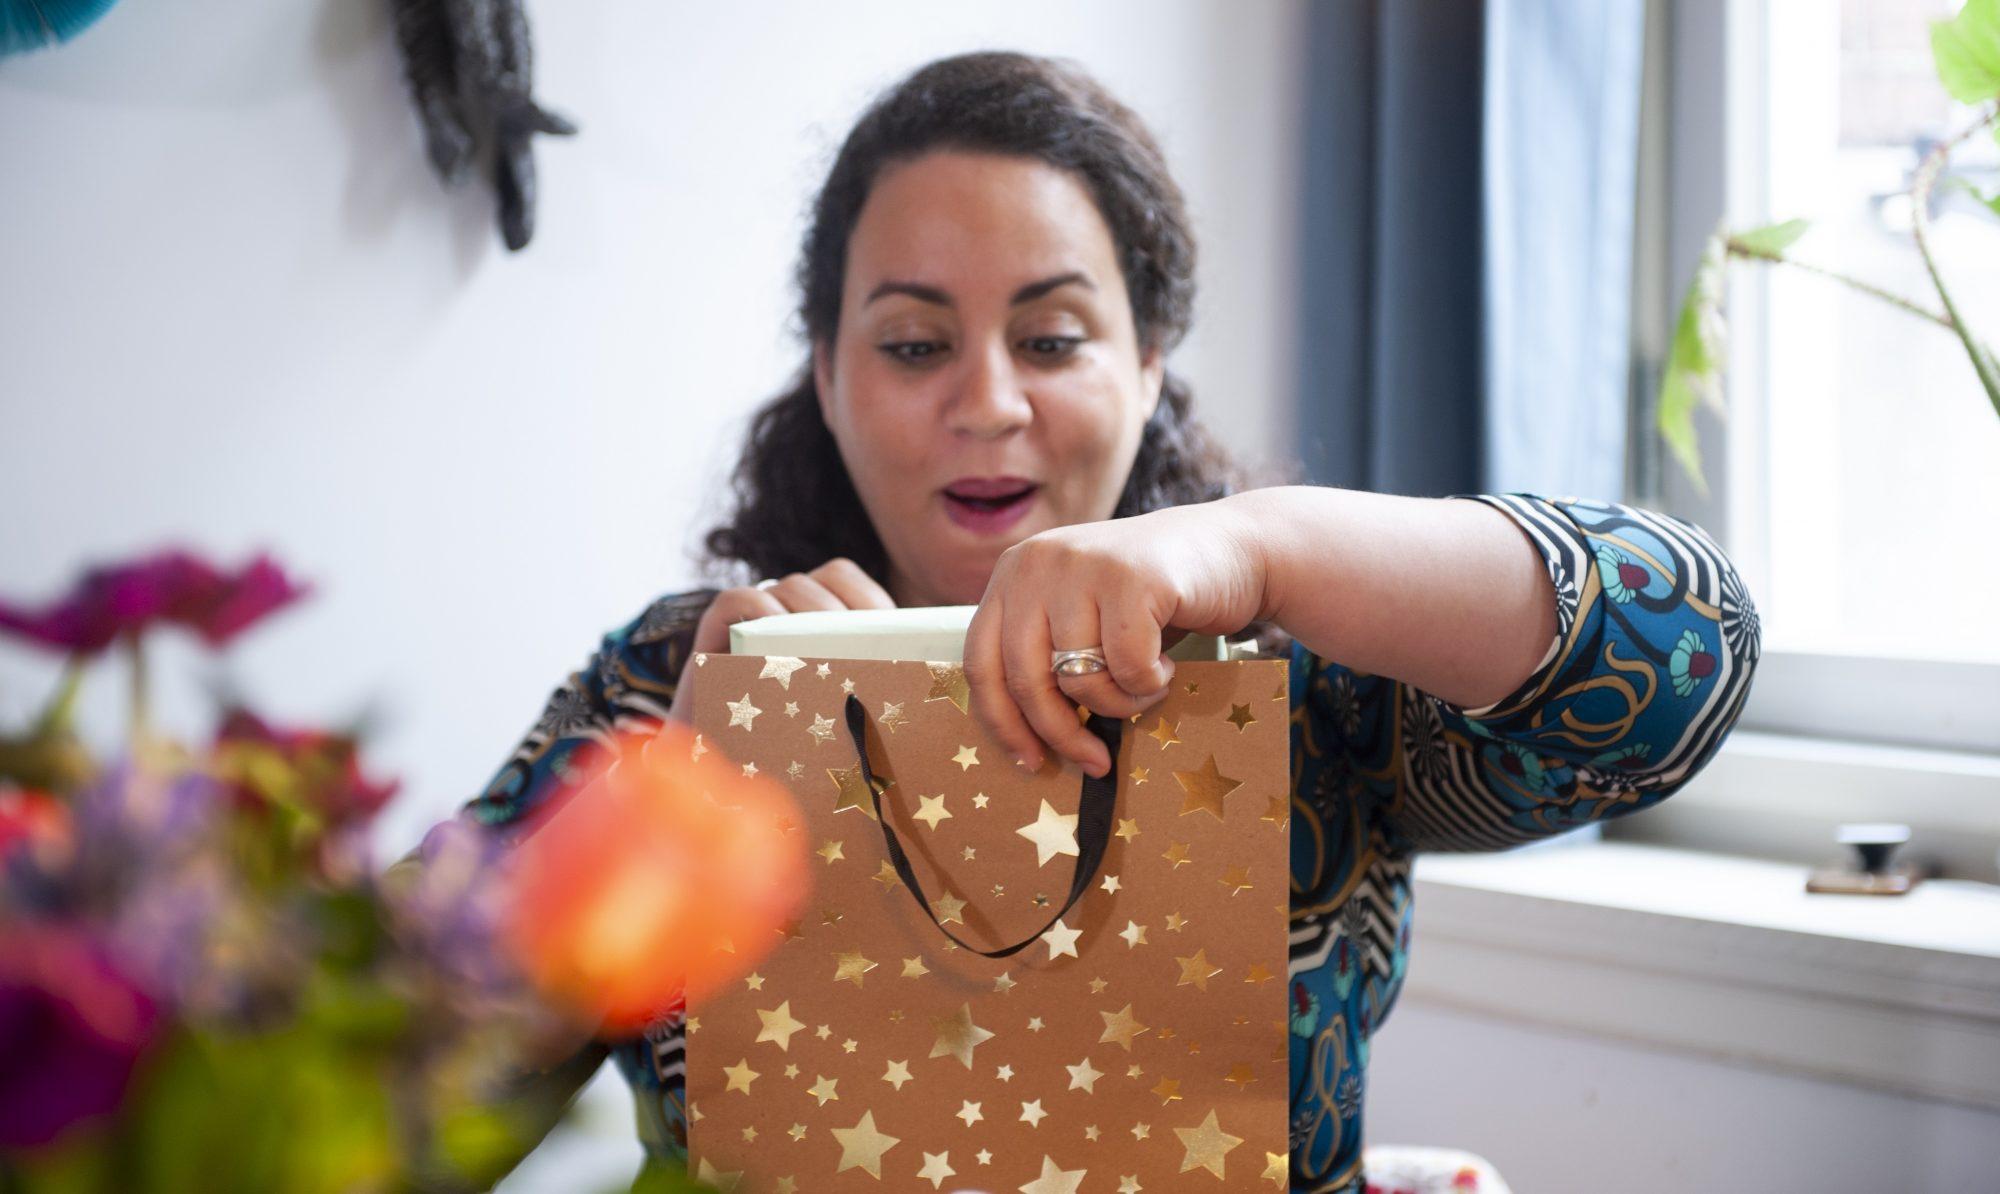 woman opening gift, satisfyer pro 2 vibrator